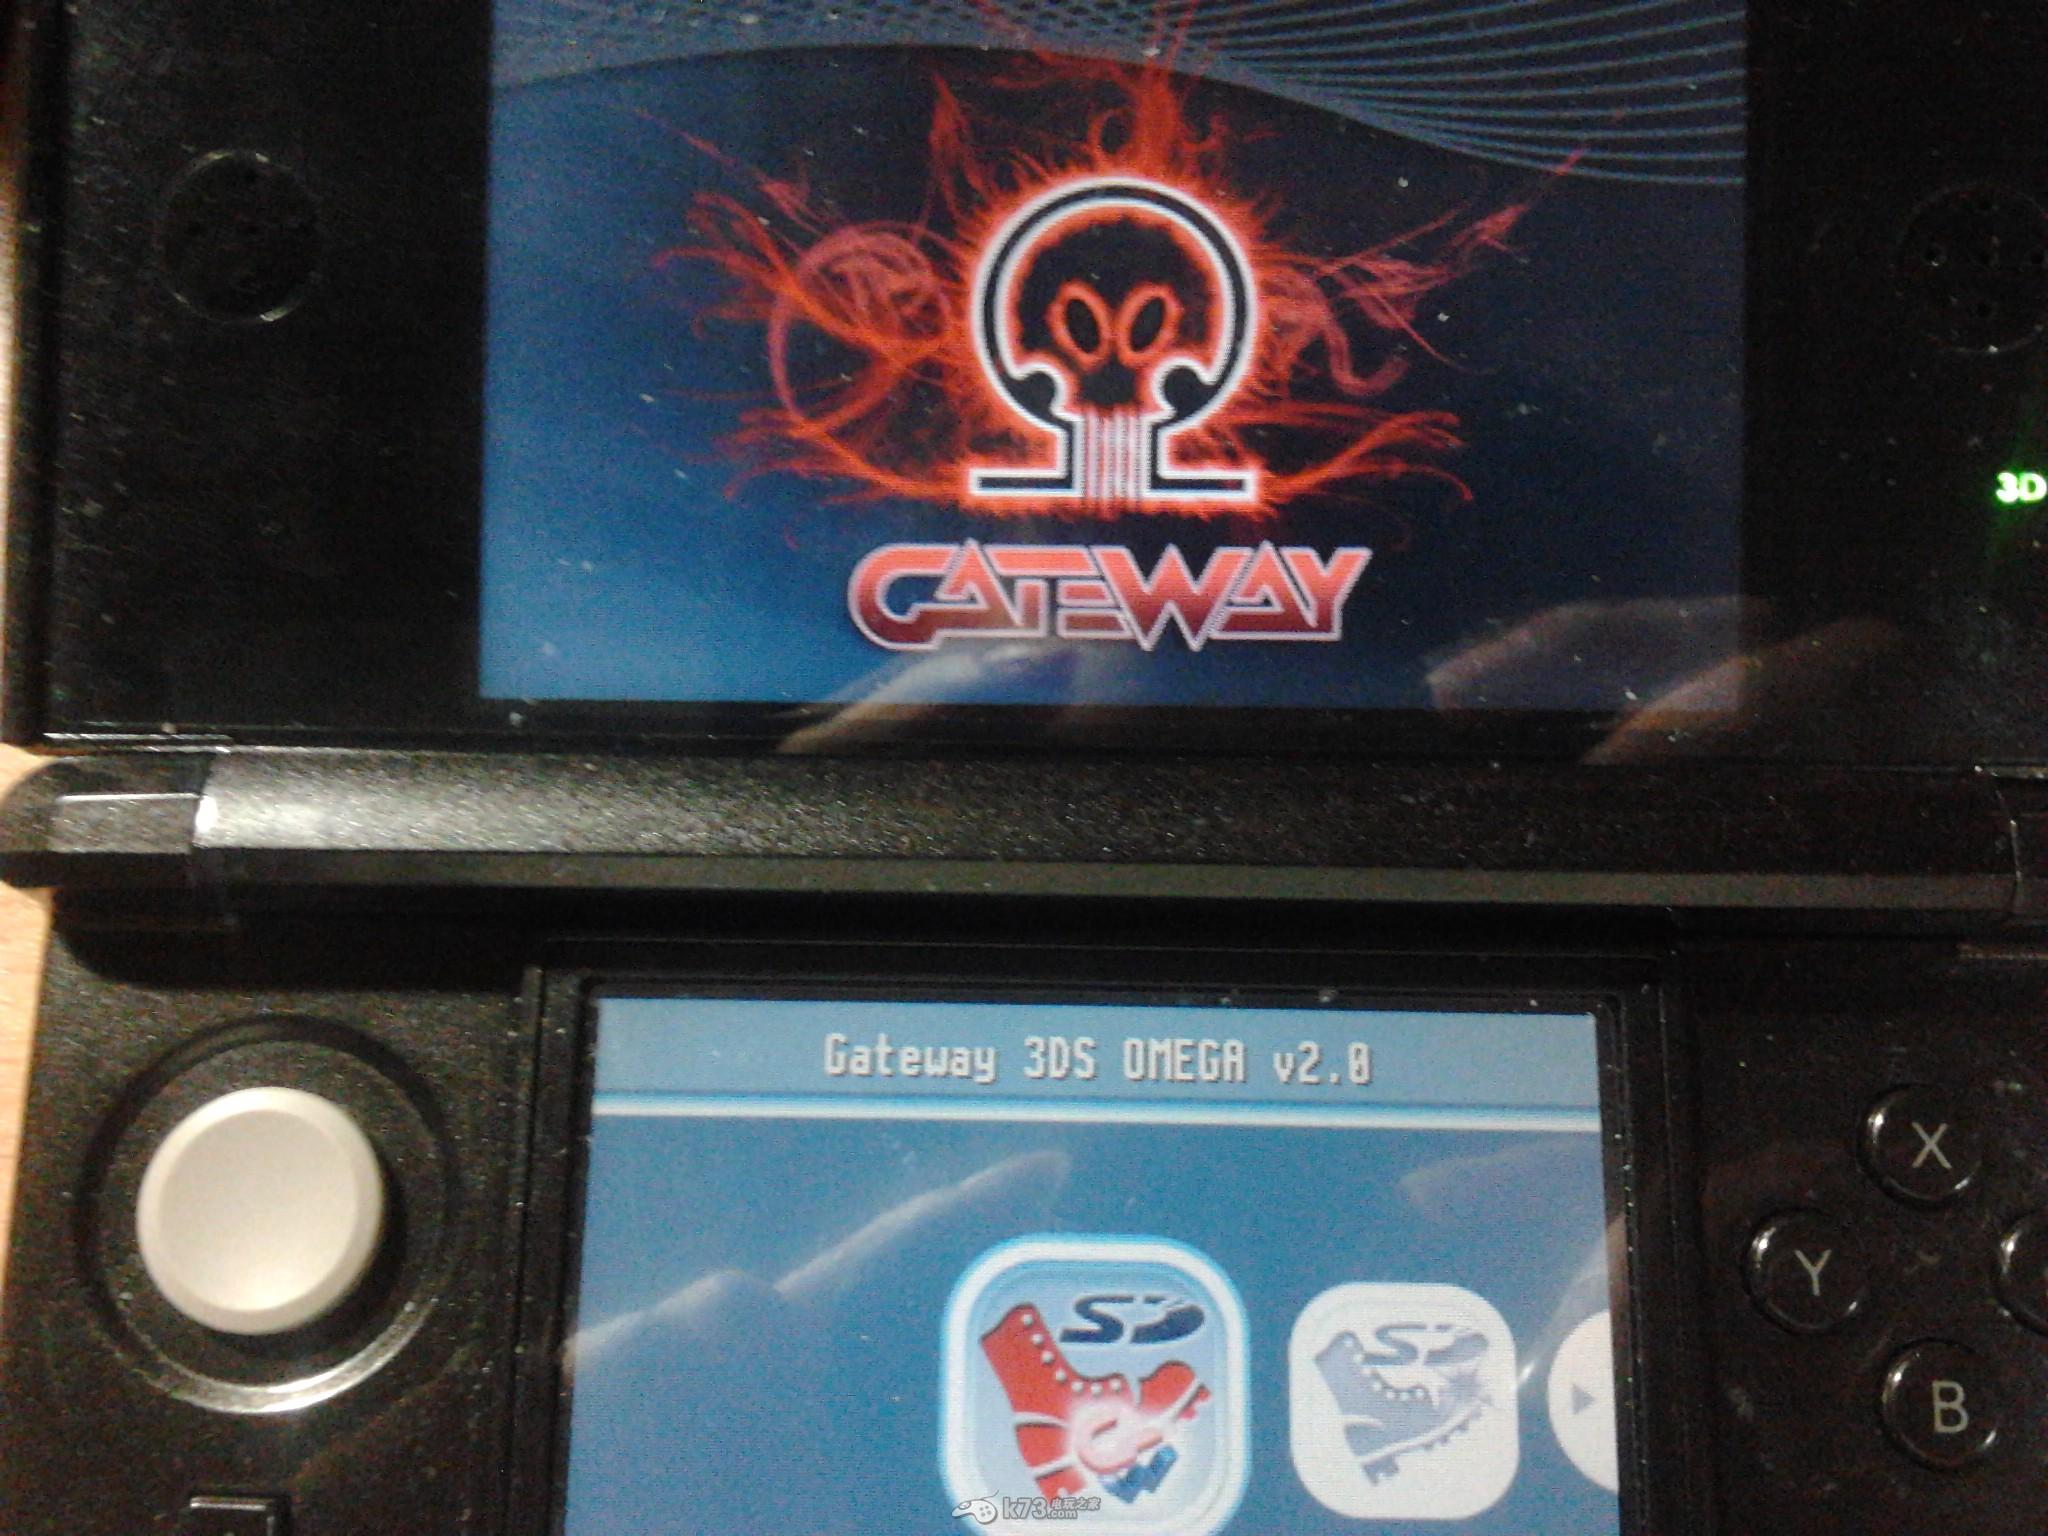 gateway 2.0 Omega固件破解教程 支持口袋妖怪xy